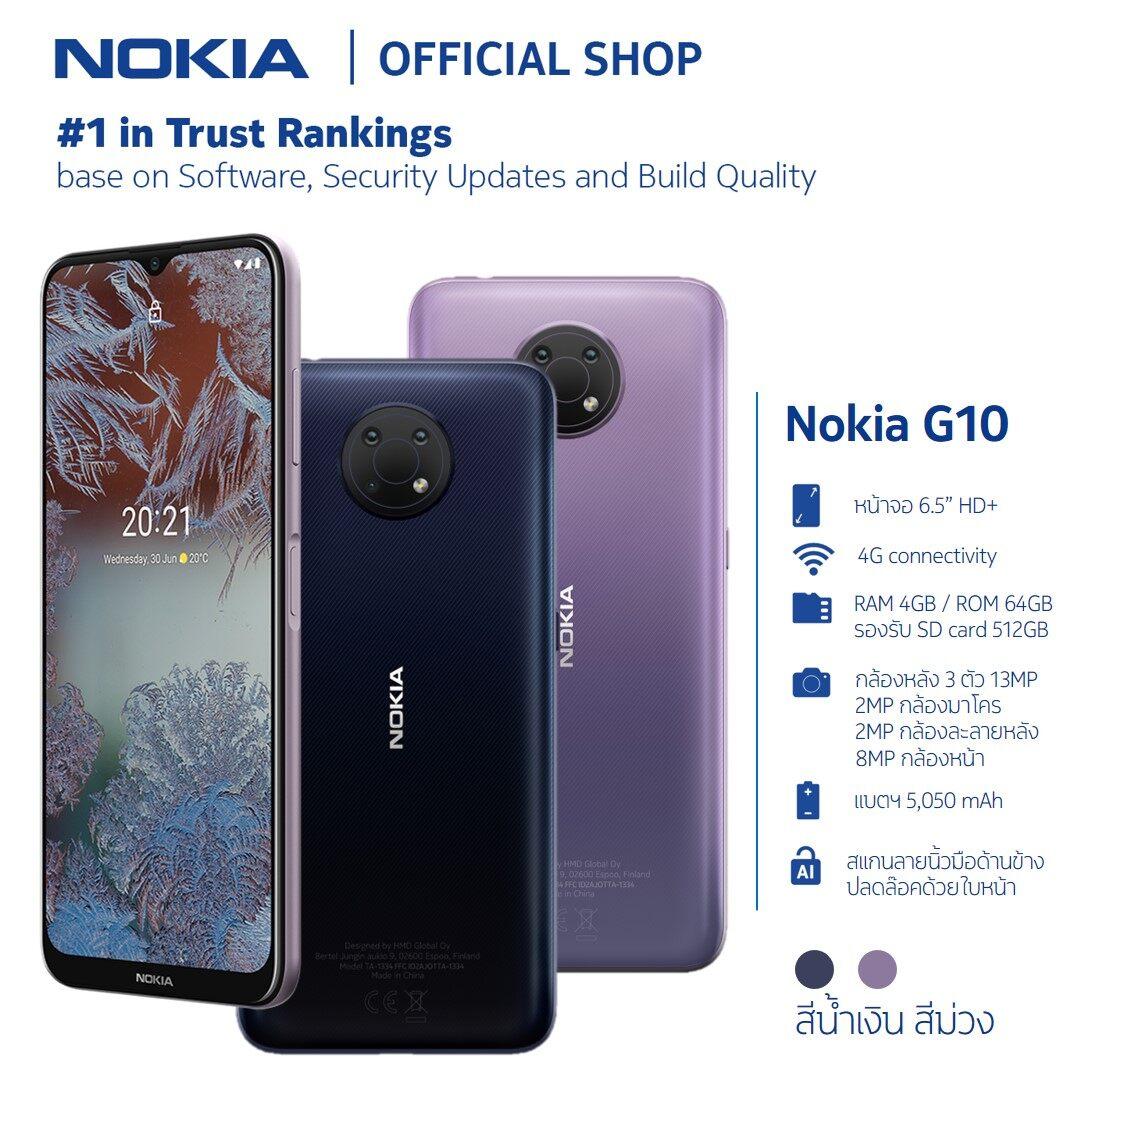 "Nokia G10 (4/64GB) จอใหญ่ 6.5"" กล้องหลัง 3 ตัว 13MP แบตฯ 5,050 mAh (เครื่องศูนย์ไทยรับประกัน 1 ปี)"